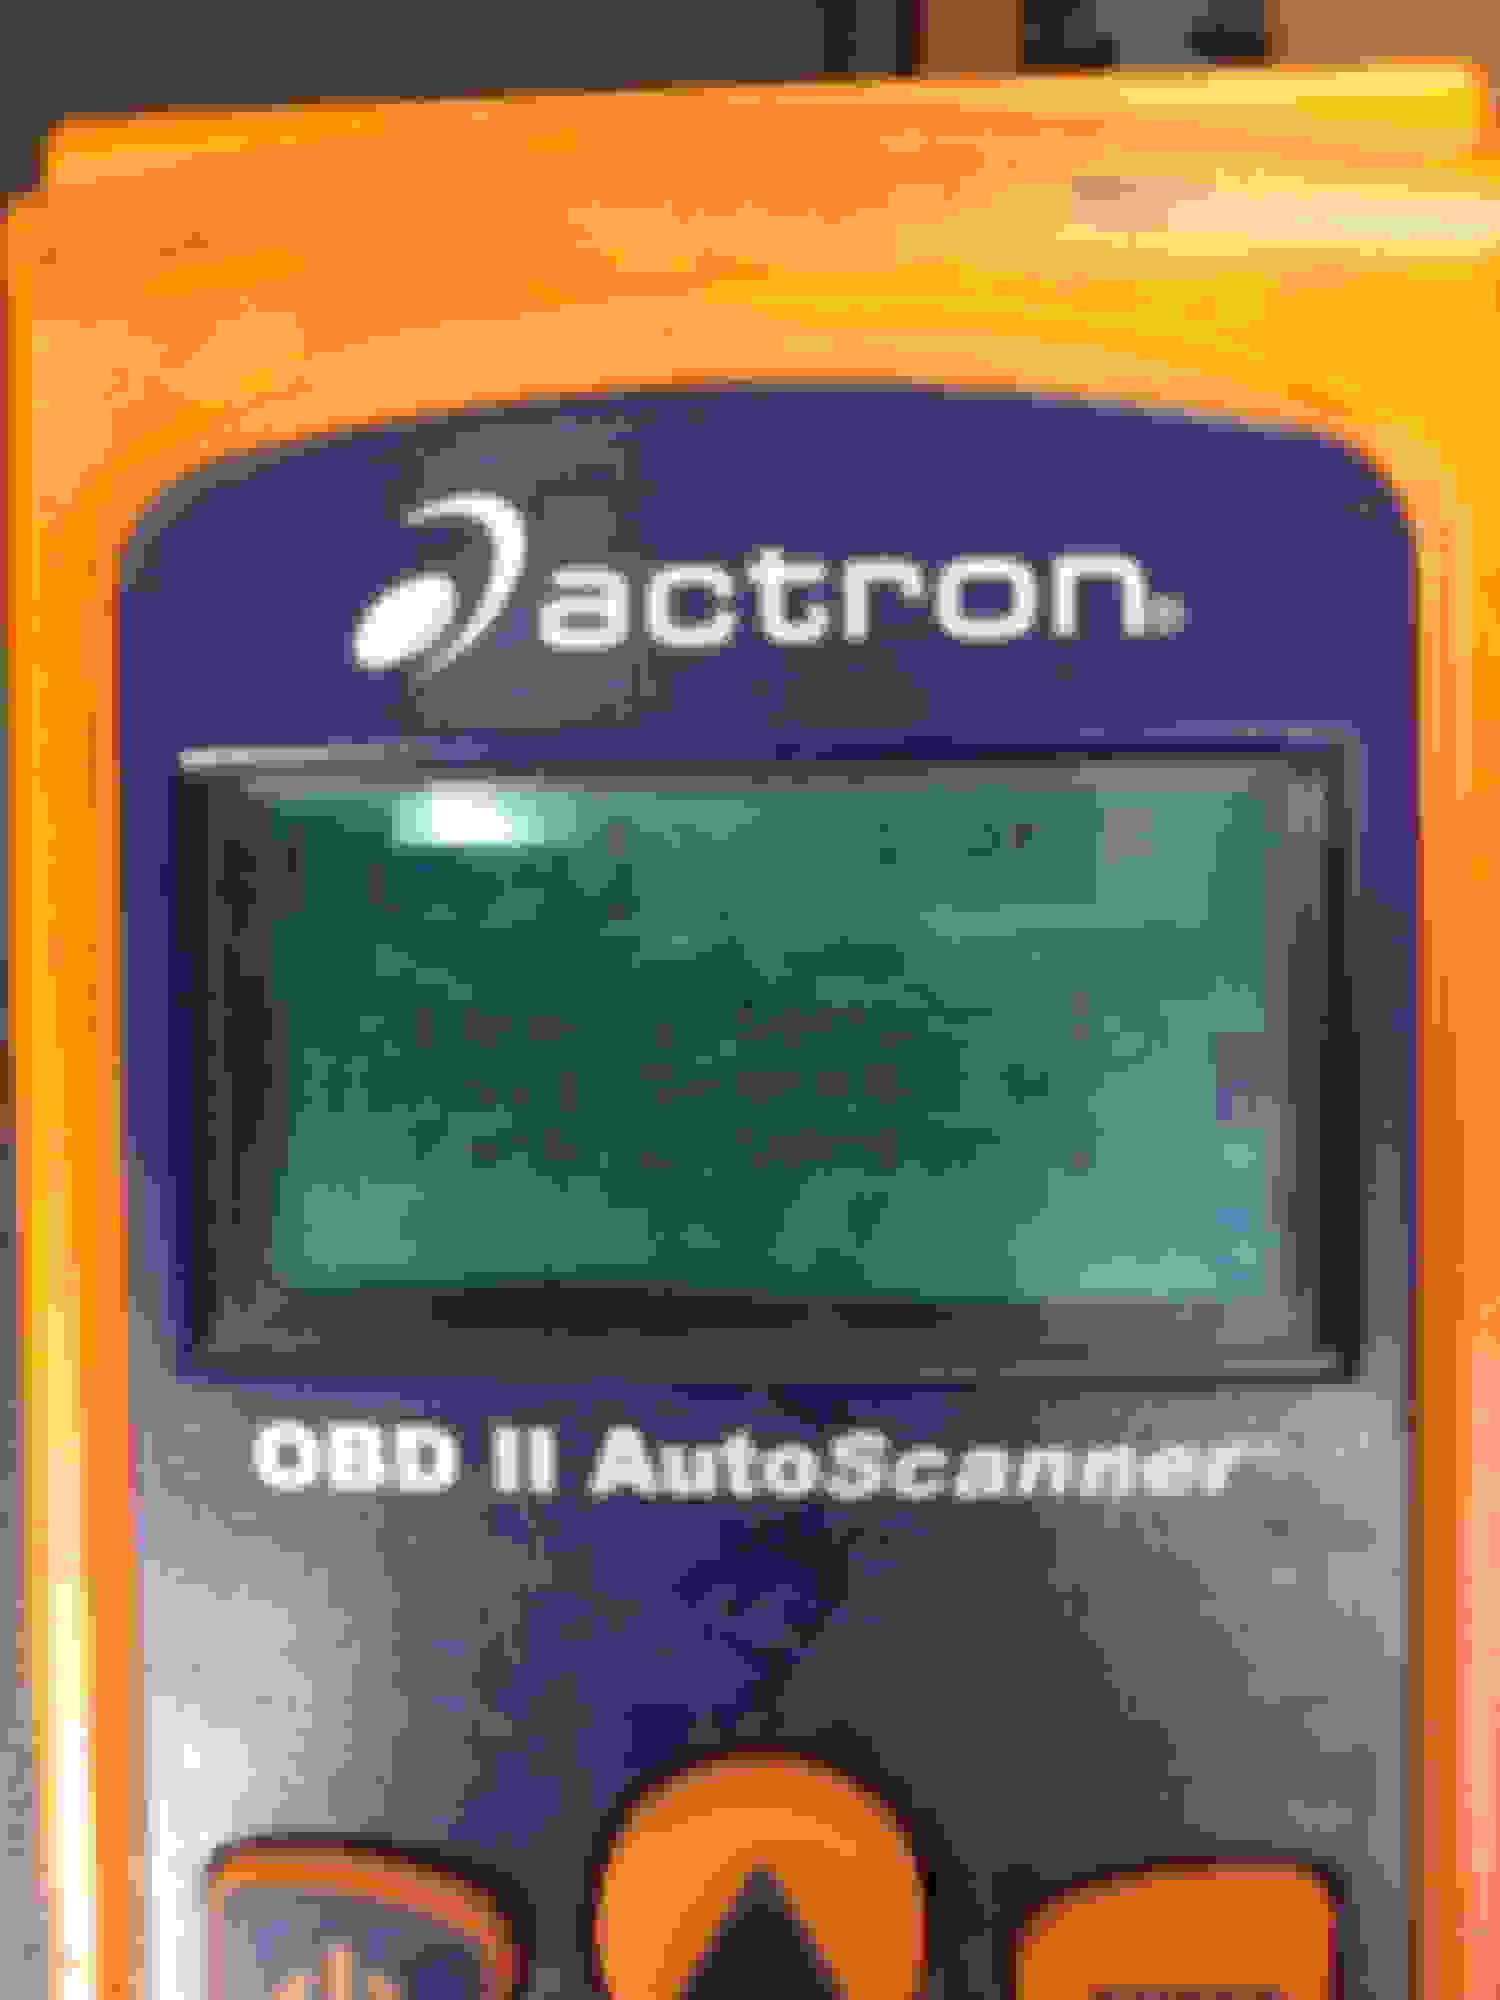 P2202 Error NOx Sensor Circuit Low Input Bank 1 - MBWorld org Forums